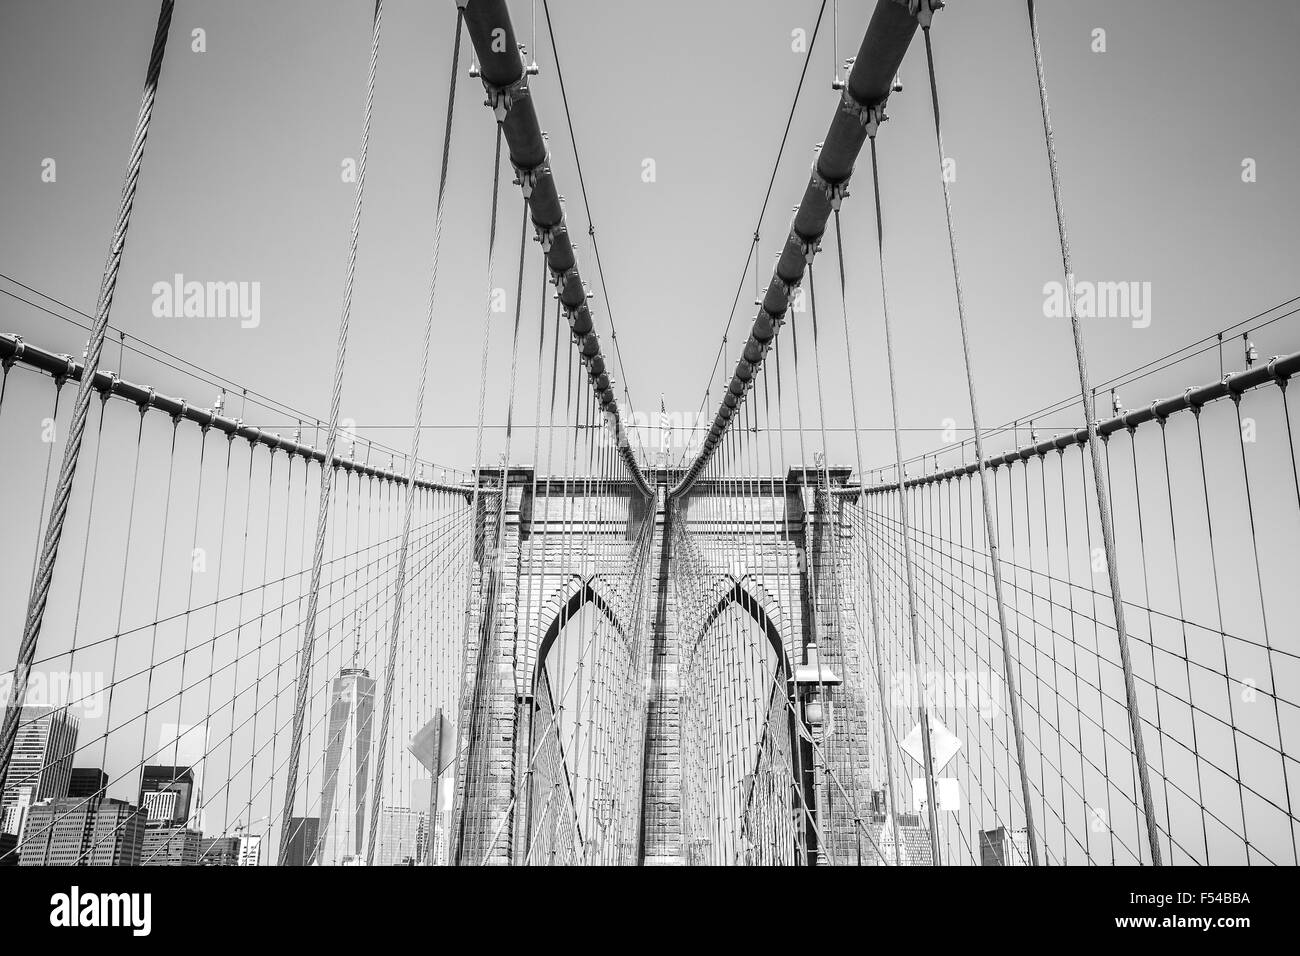 Black and white photo of the Brooklyn Bridge, NYC, USA. - Stock Image